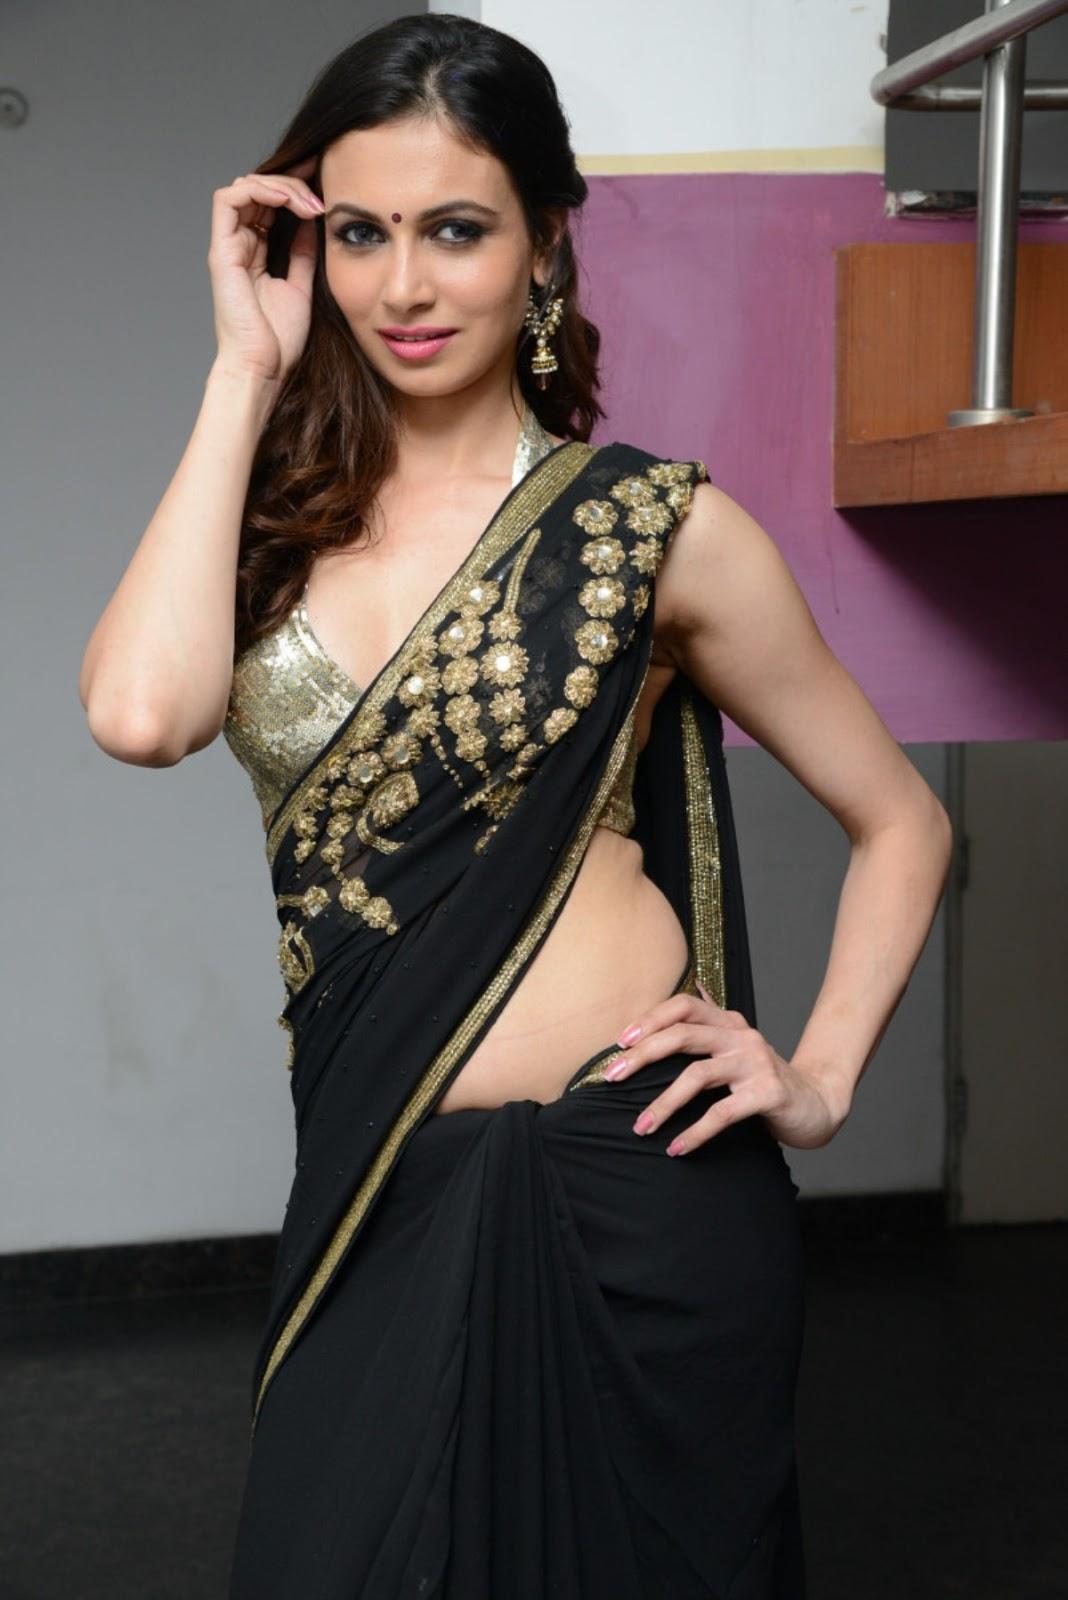 Simran Kaur Hot Cleavage Show Photos In Saree - Hot Blog -1640